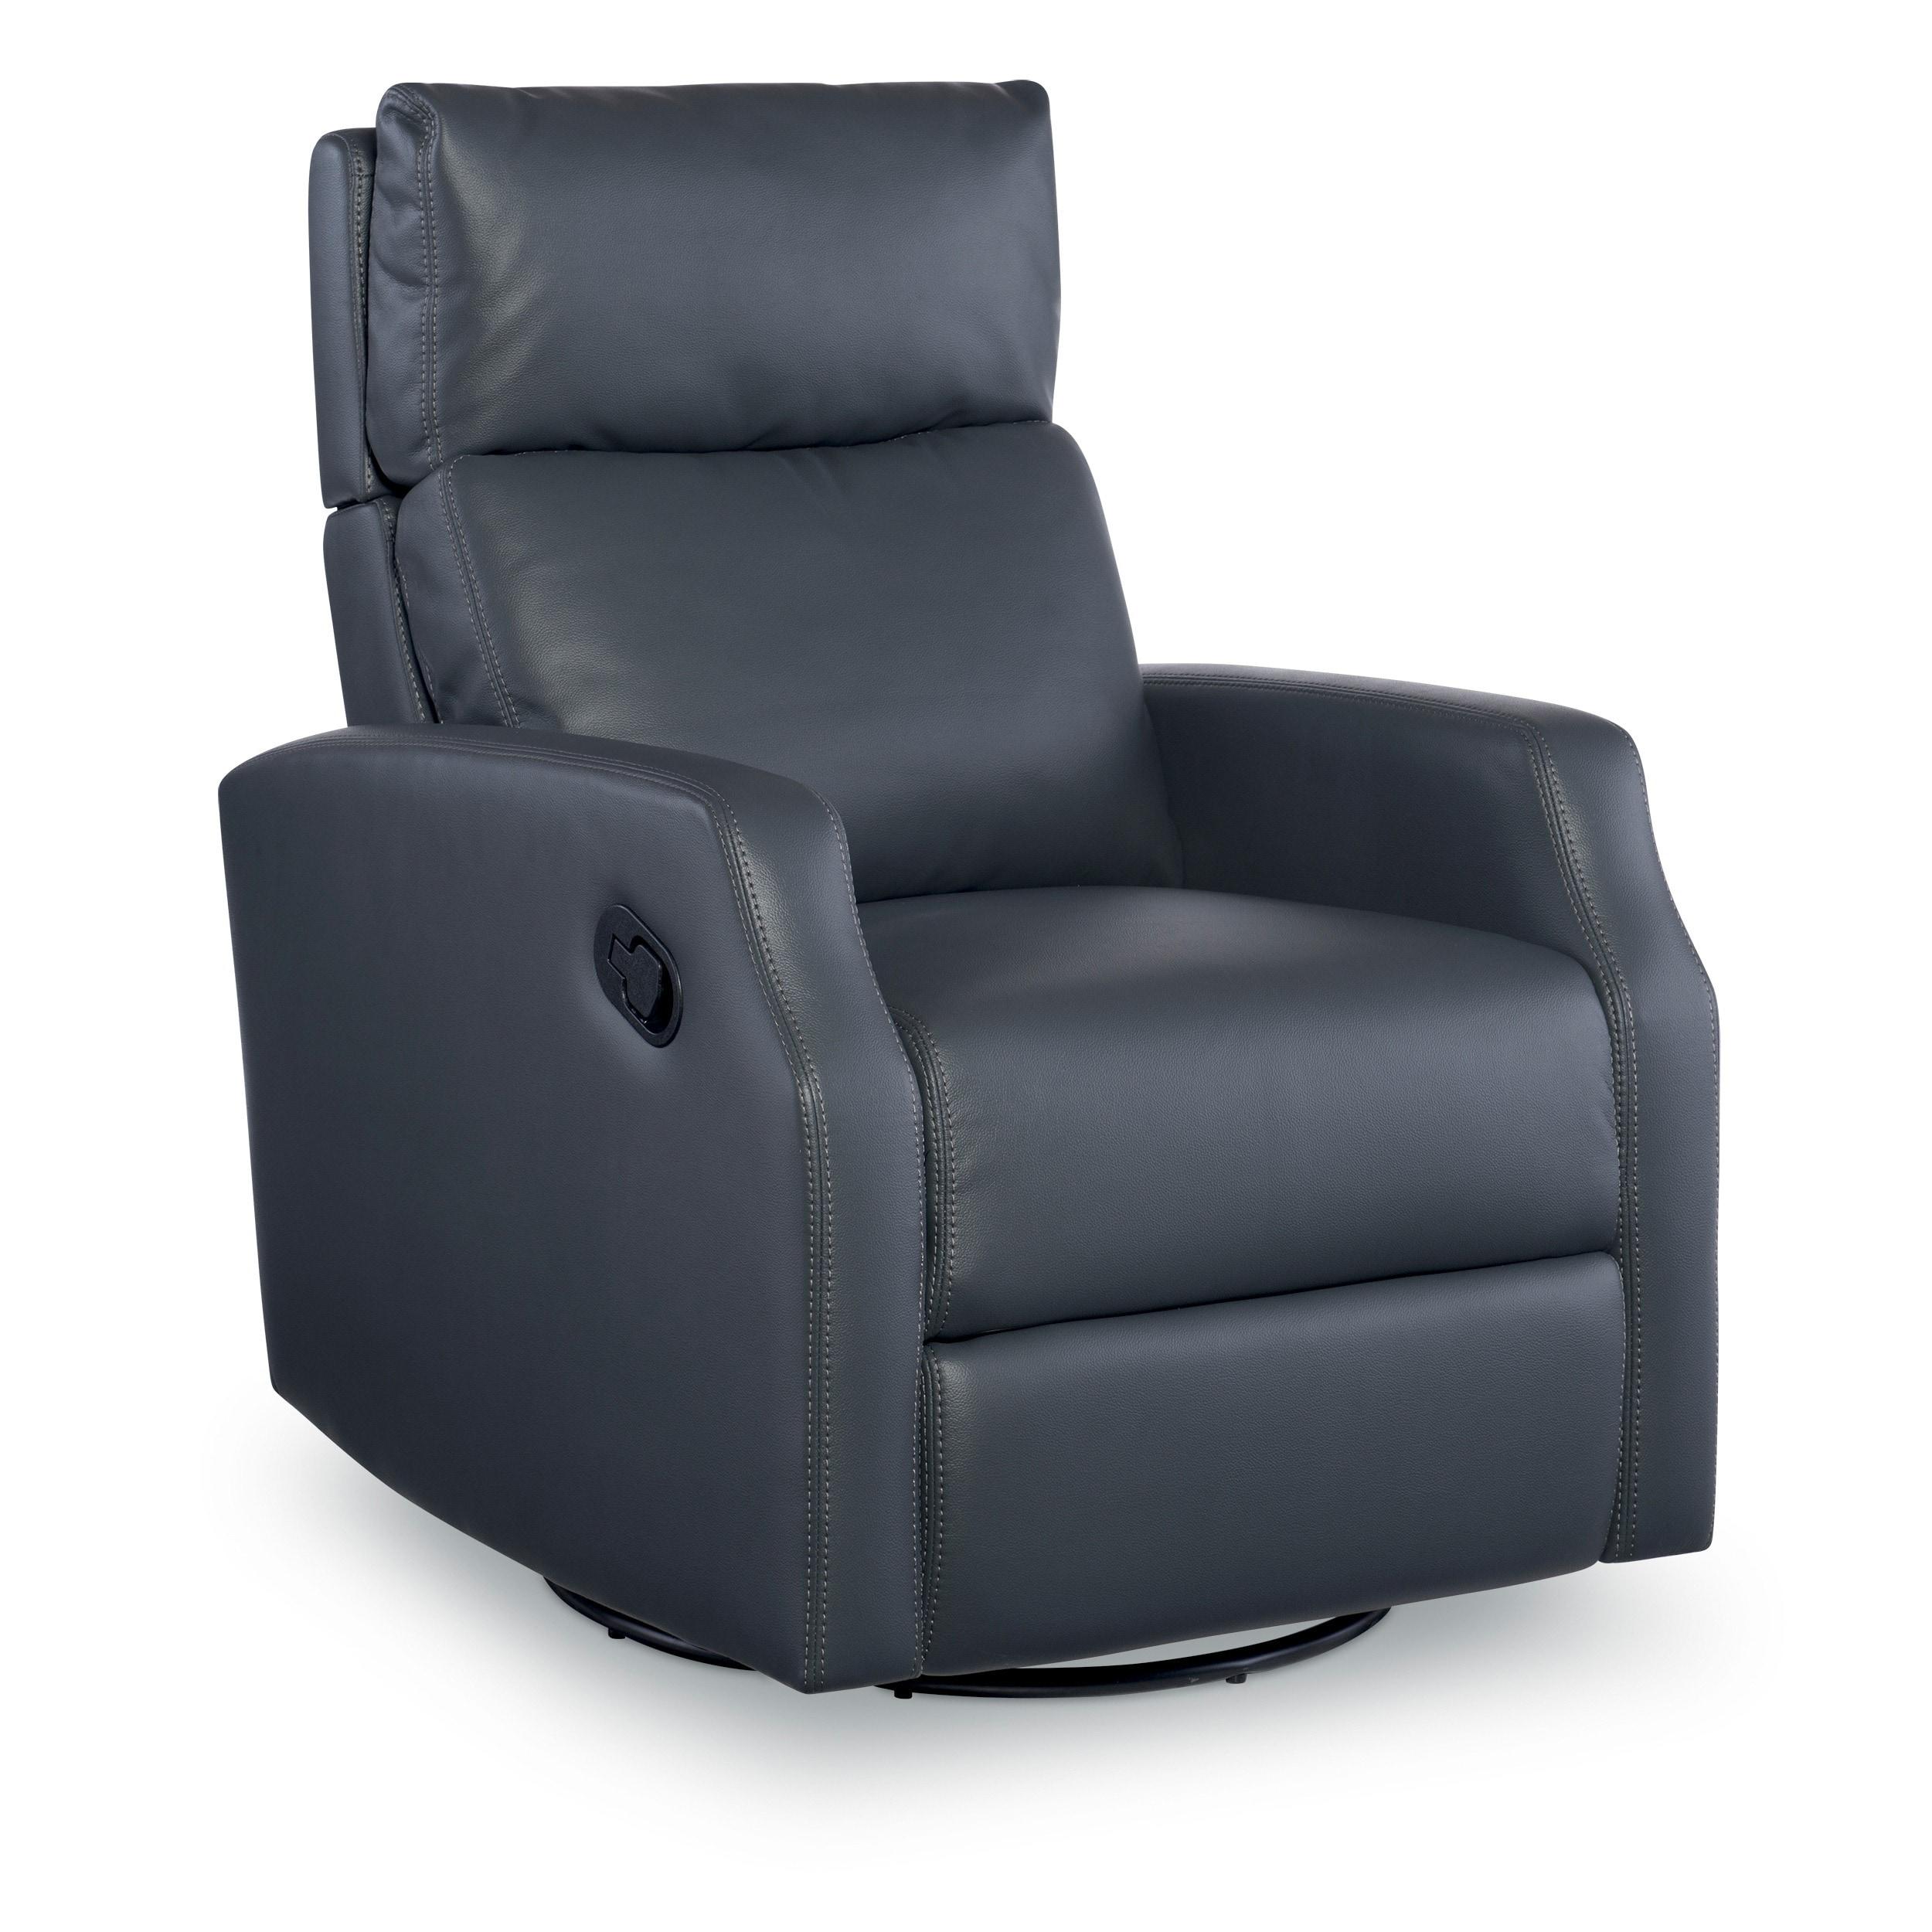 lukeglider products threshold height glider recliner great leather item luke trim sofa width cheers